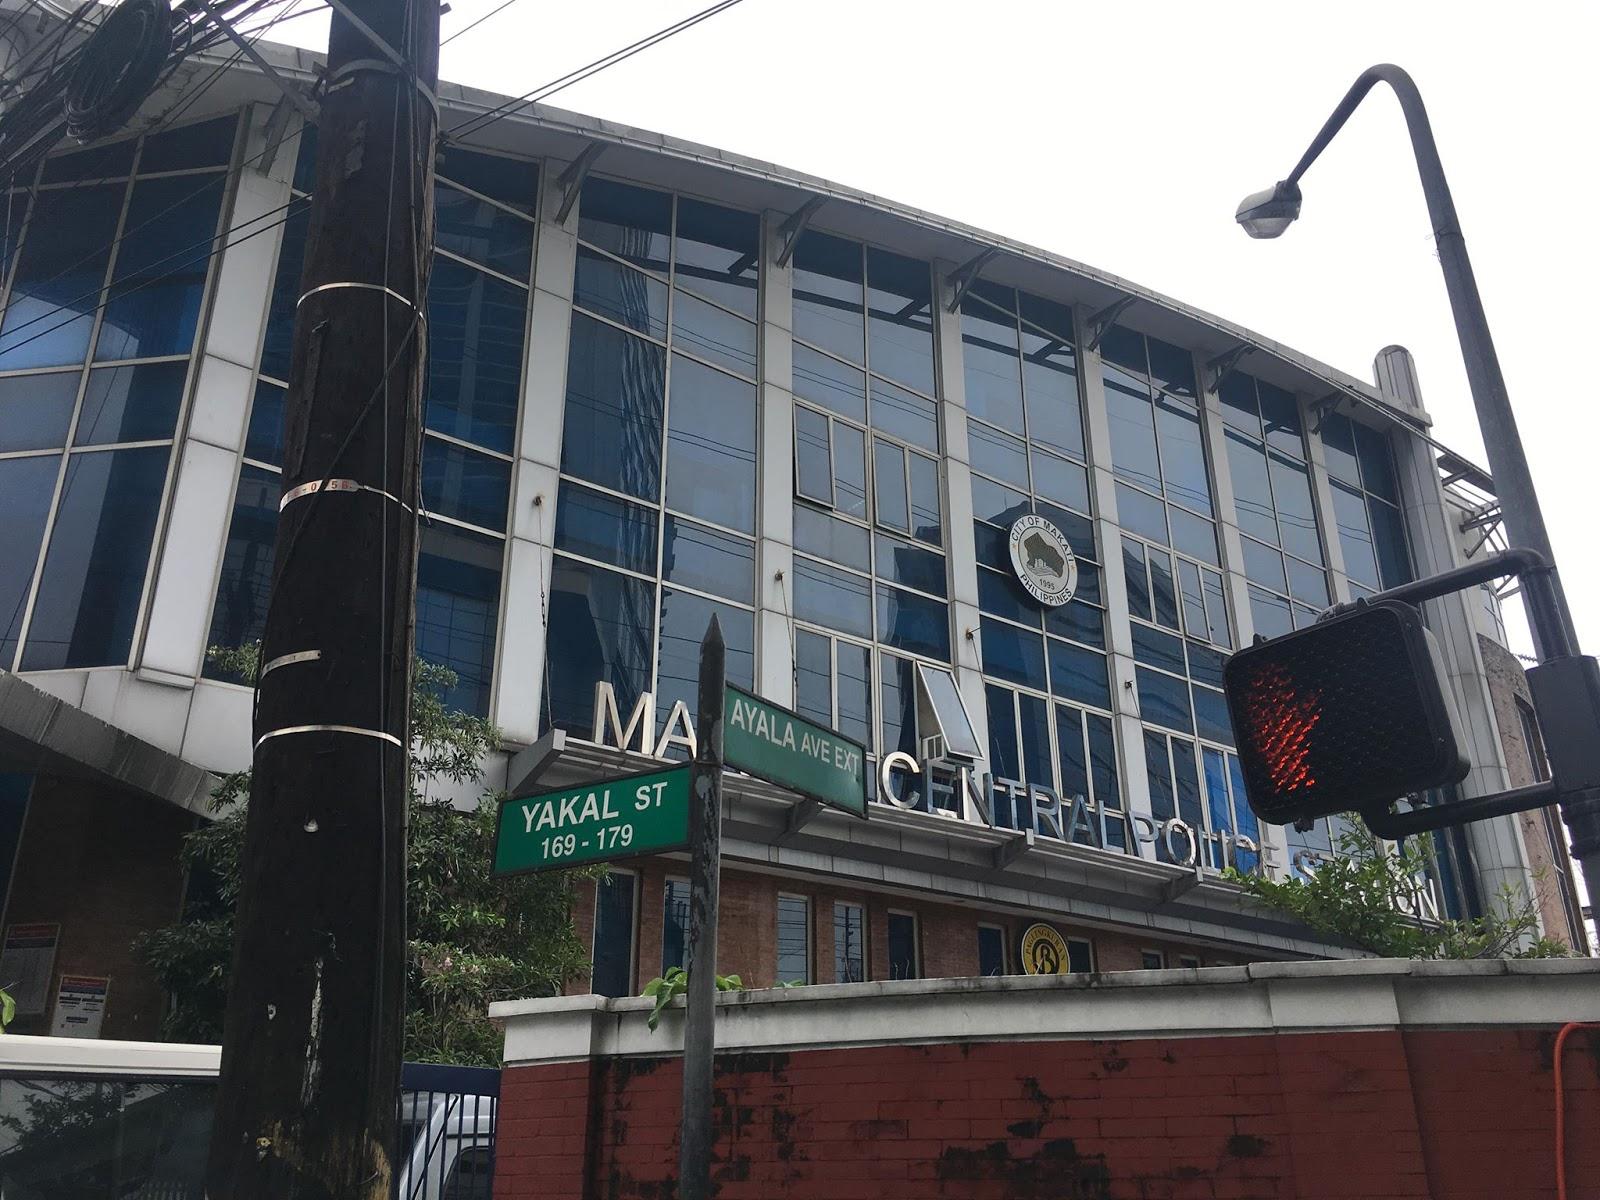 makati central police station